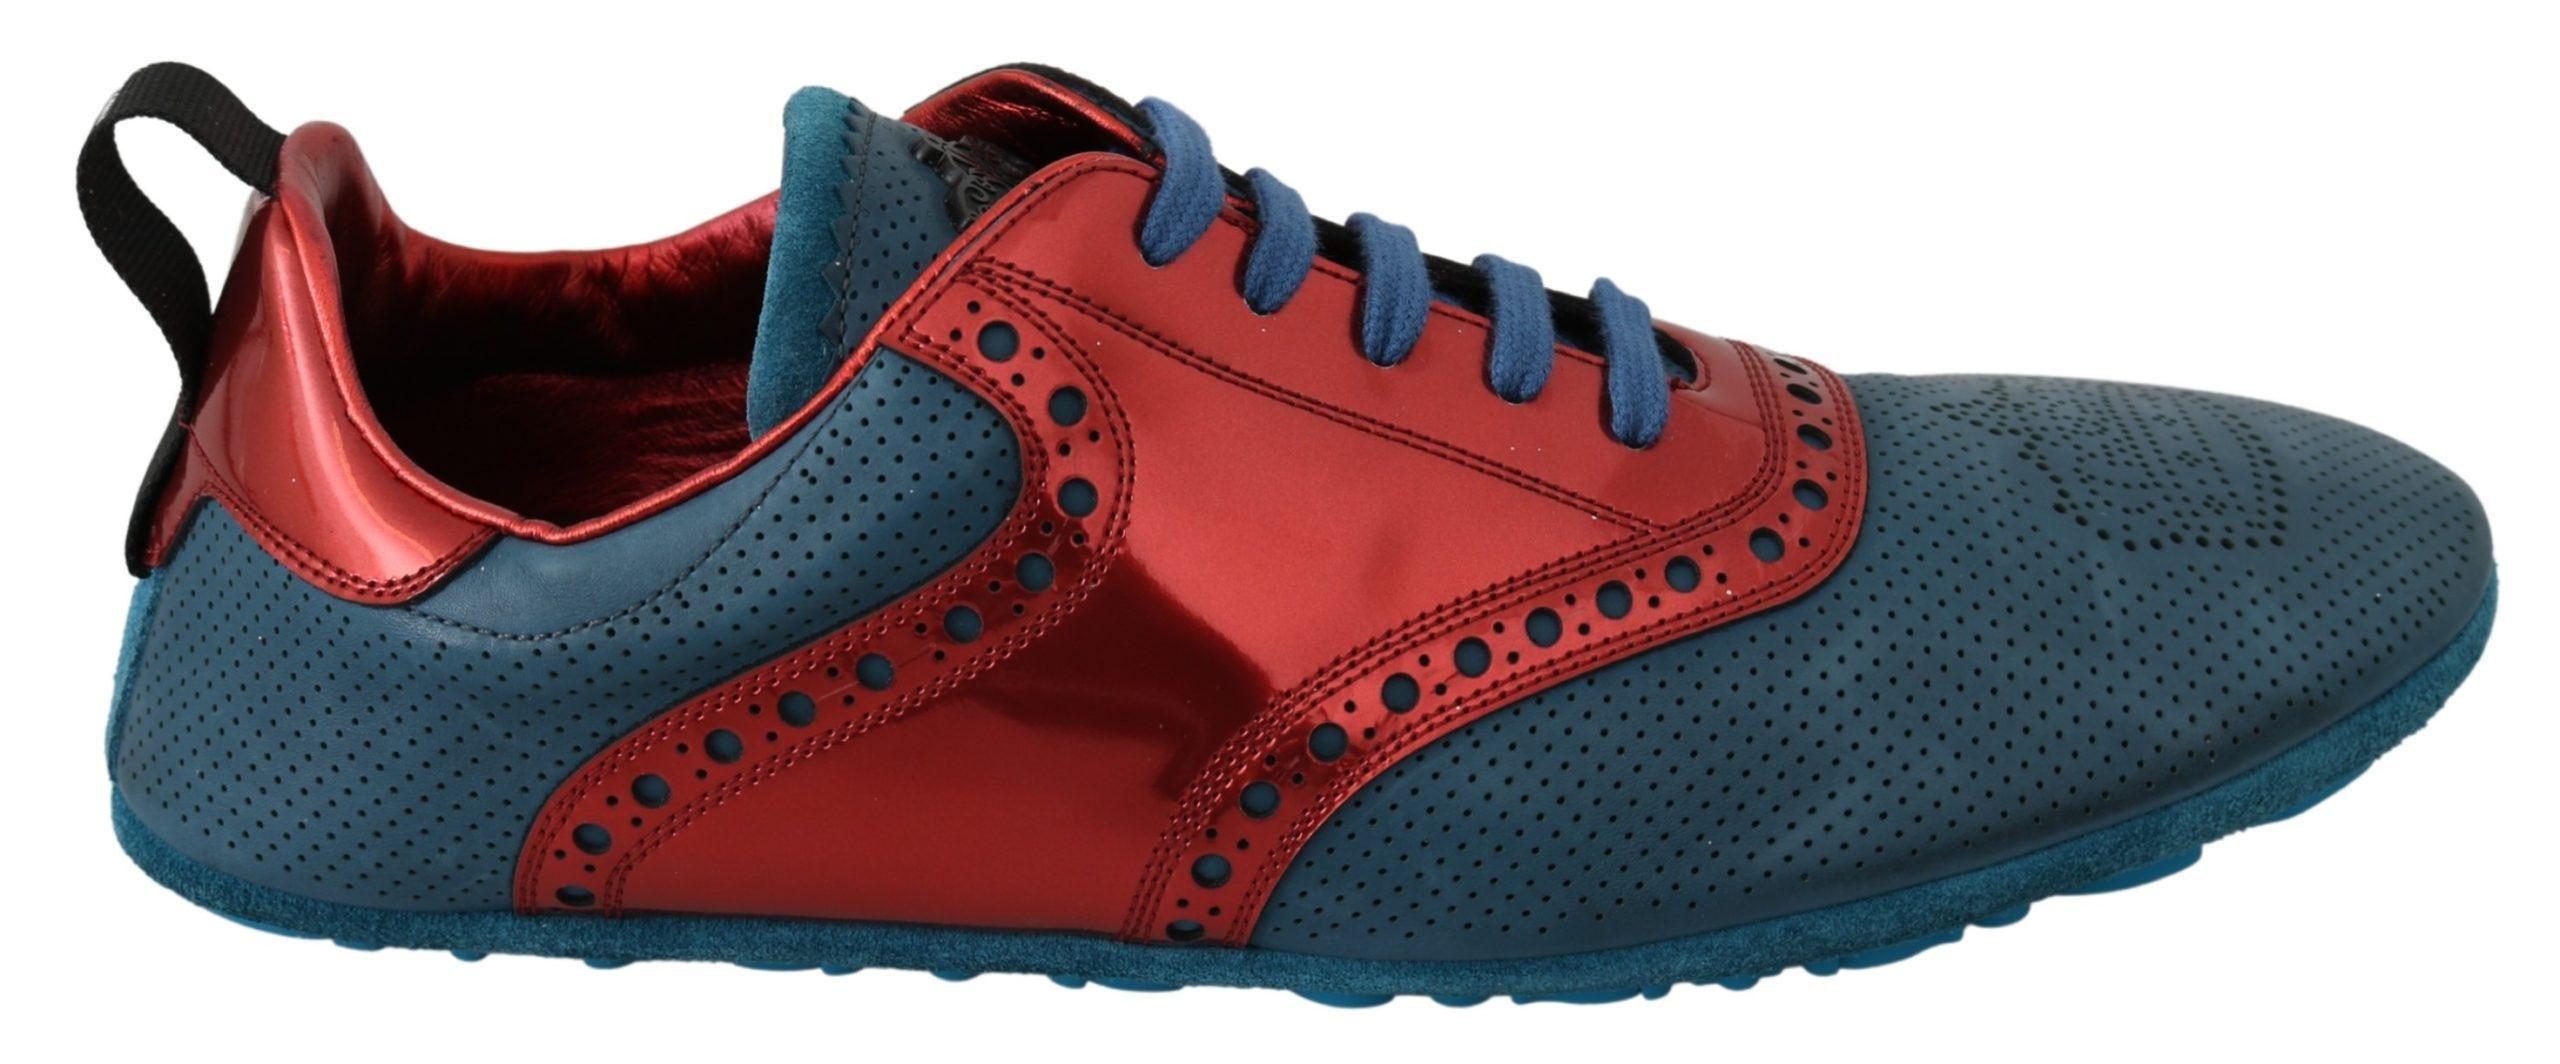 Dolce & Gabbana Men's Shiny Leather Crown Trainer Red MV3037 - EU44/US11